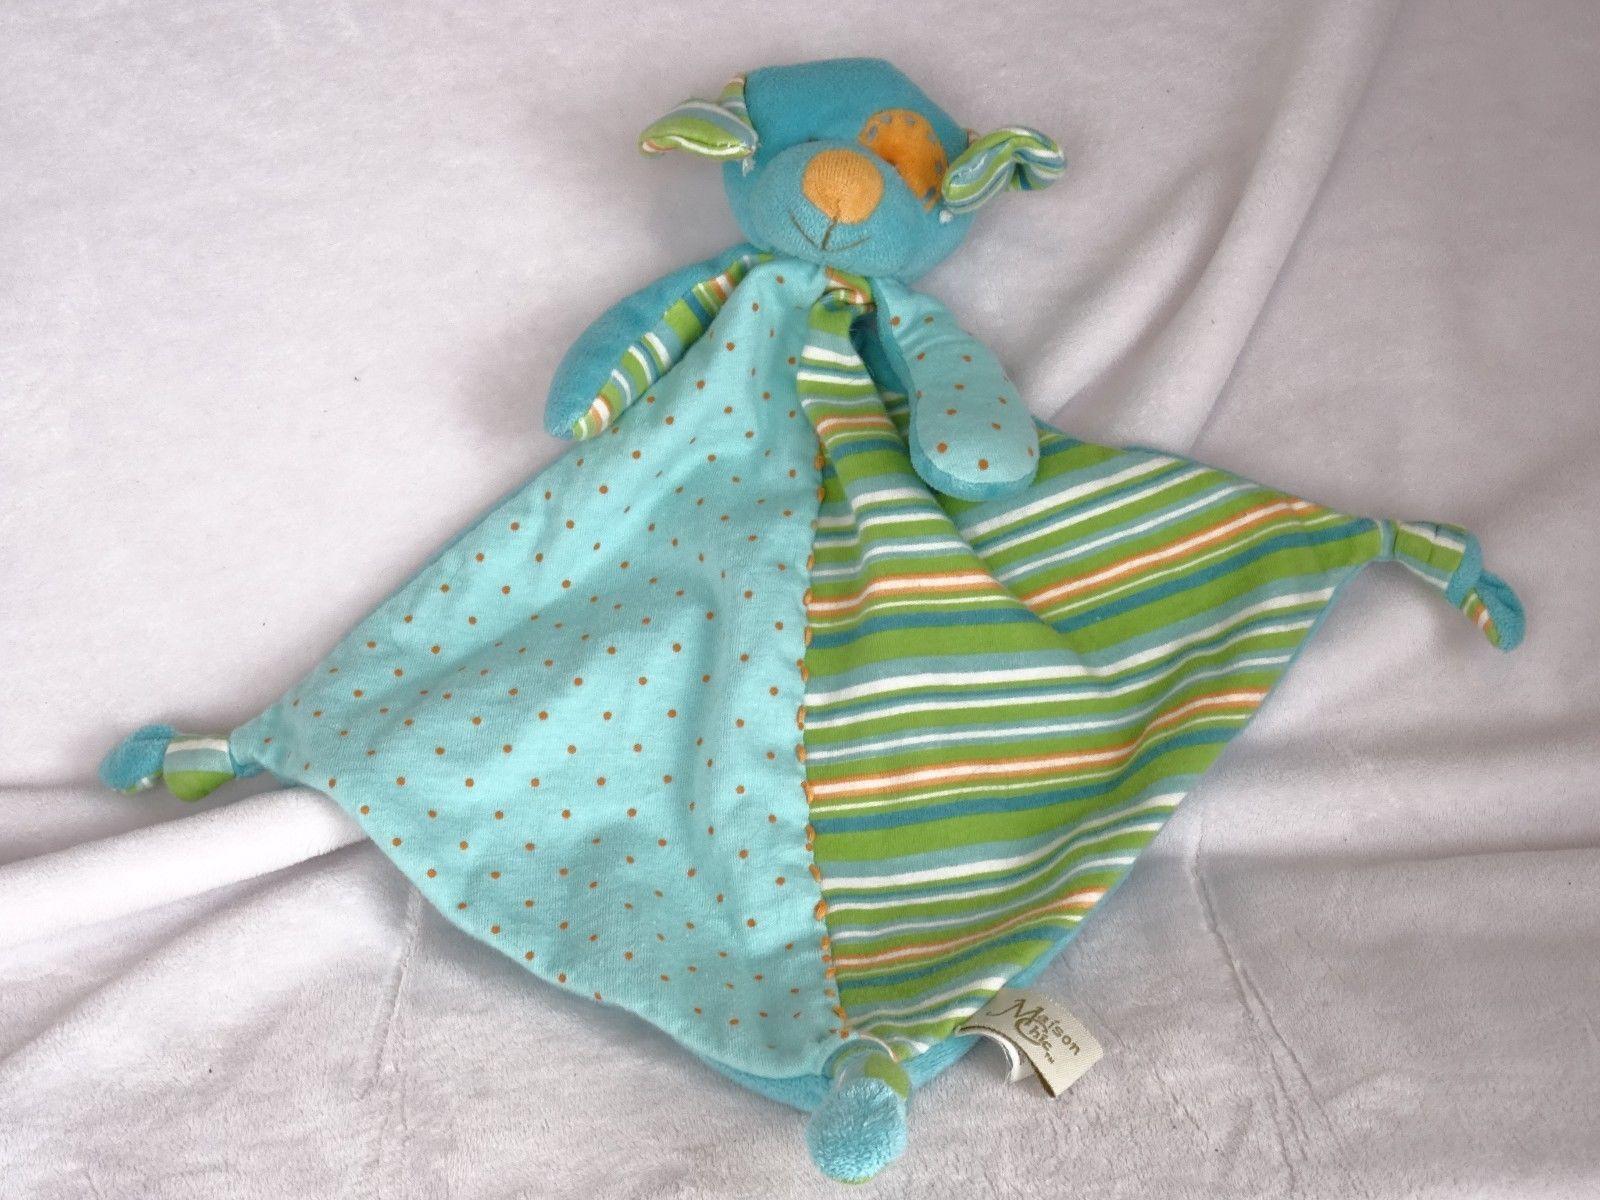 Baby Maison Chic Pink Bunny Rabbit Knot Lovey Baby Security Blanket Polka Dot Nursery Bedding